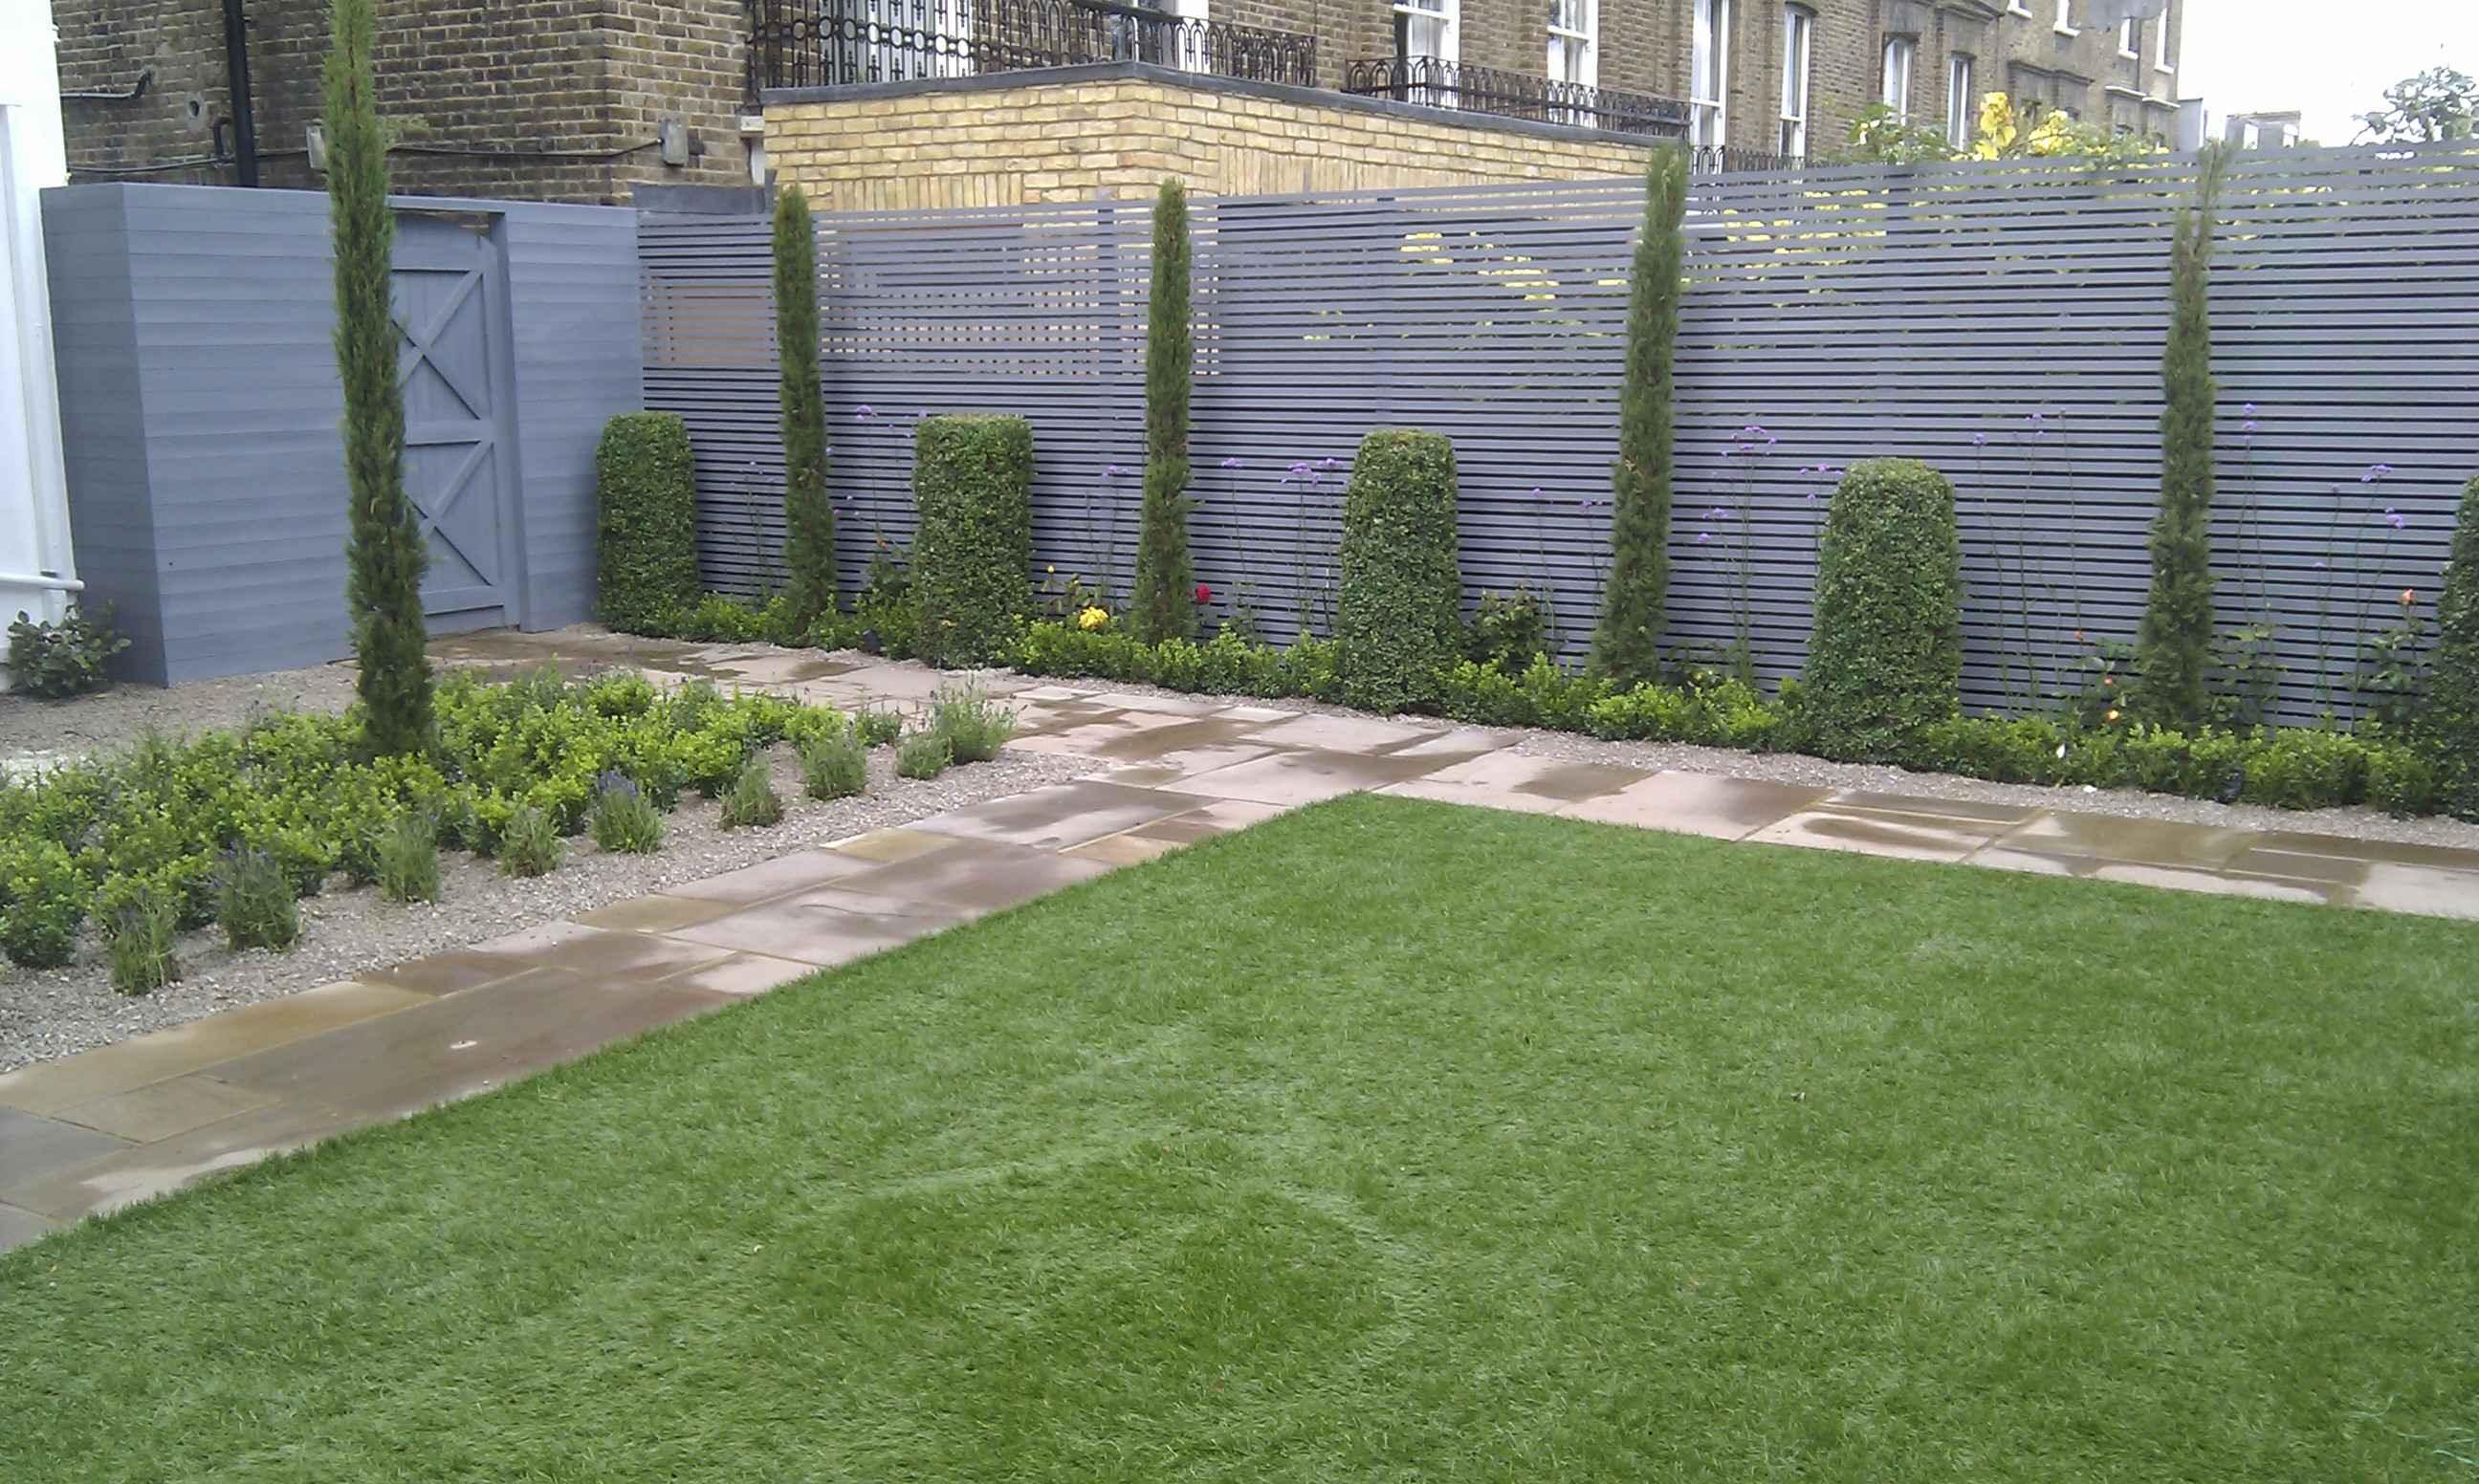 modern garden design london slatted grey privacy screen sandstone paving easy grass balau hardwood decking (15)